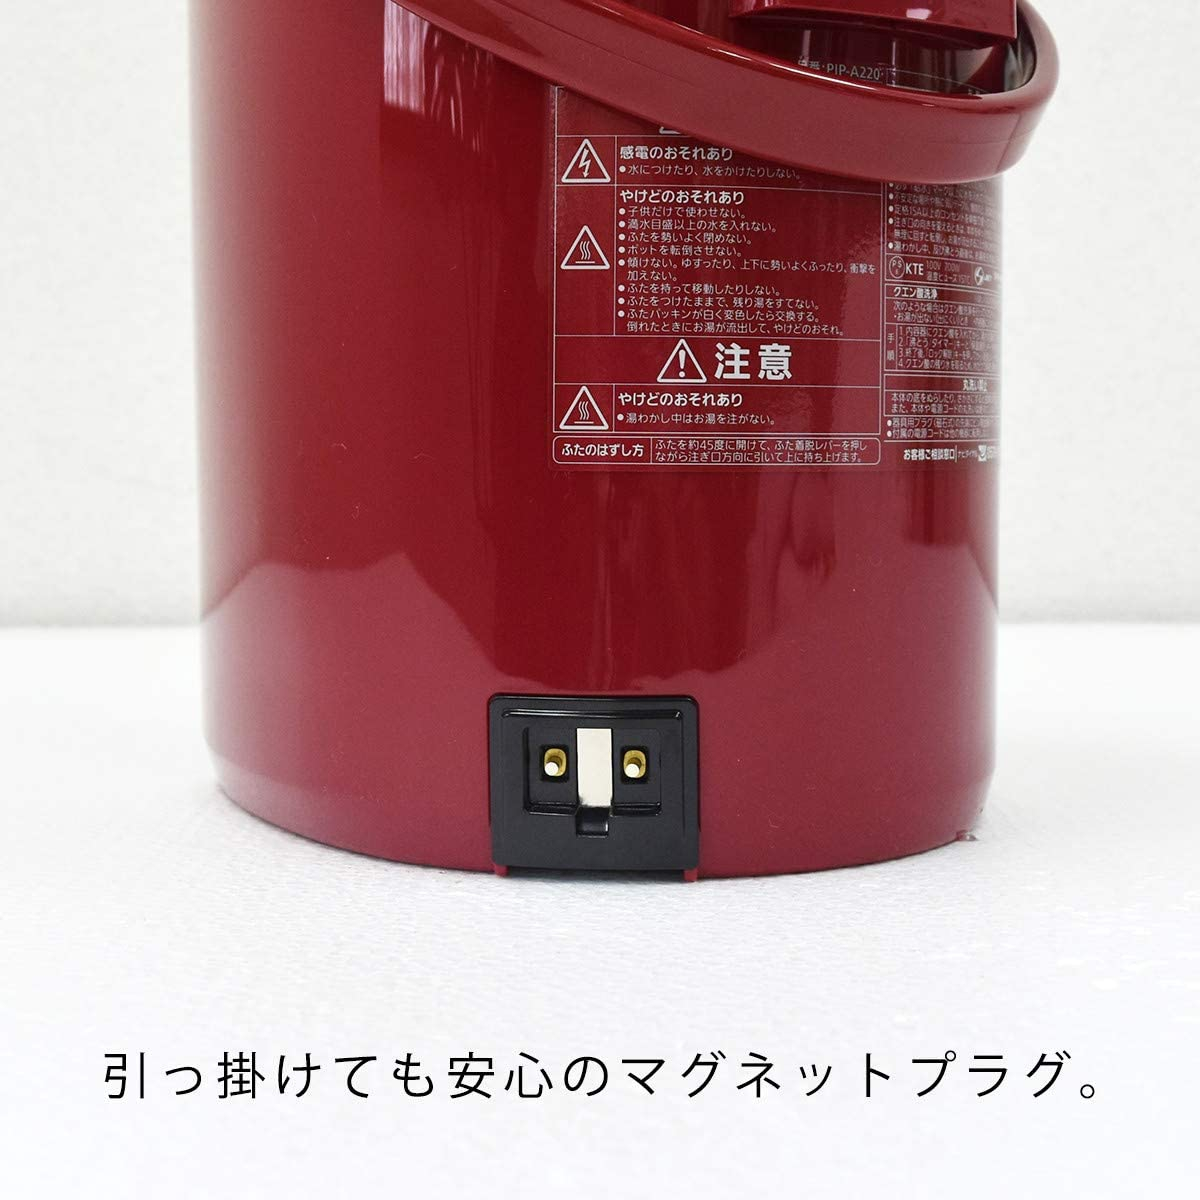 TIGER(タイガー)蒸気レスVE電気まほうびん PIP-A220の商品画像8